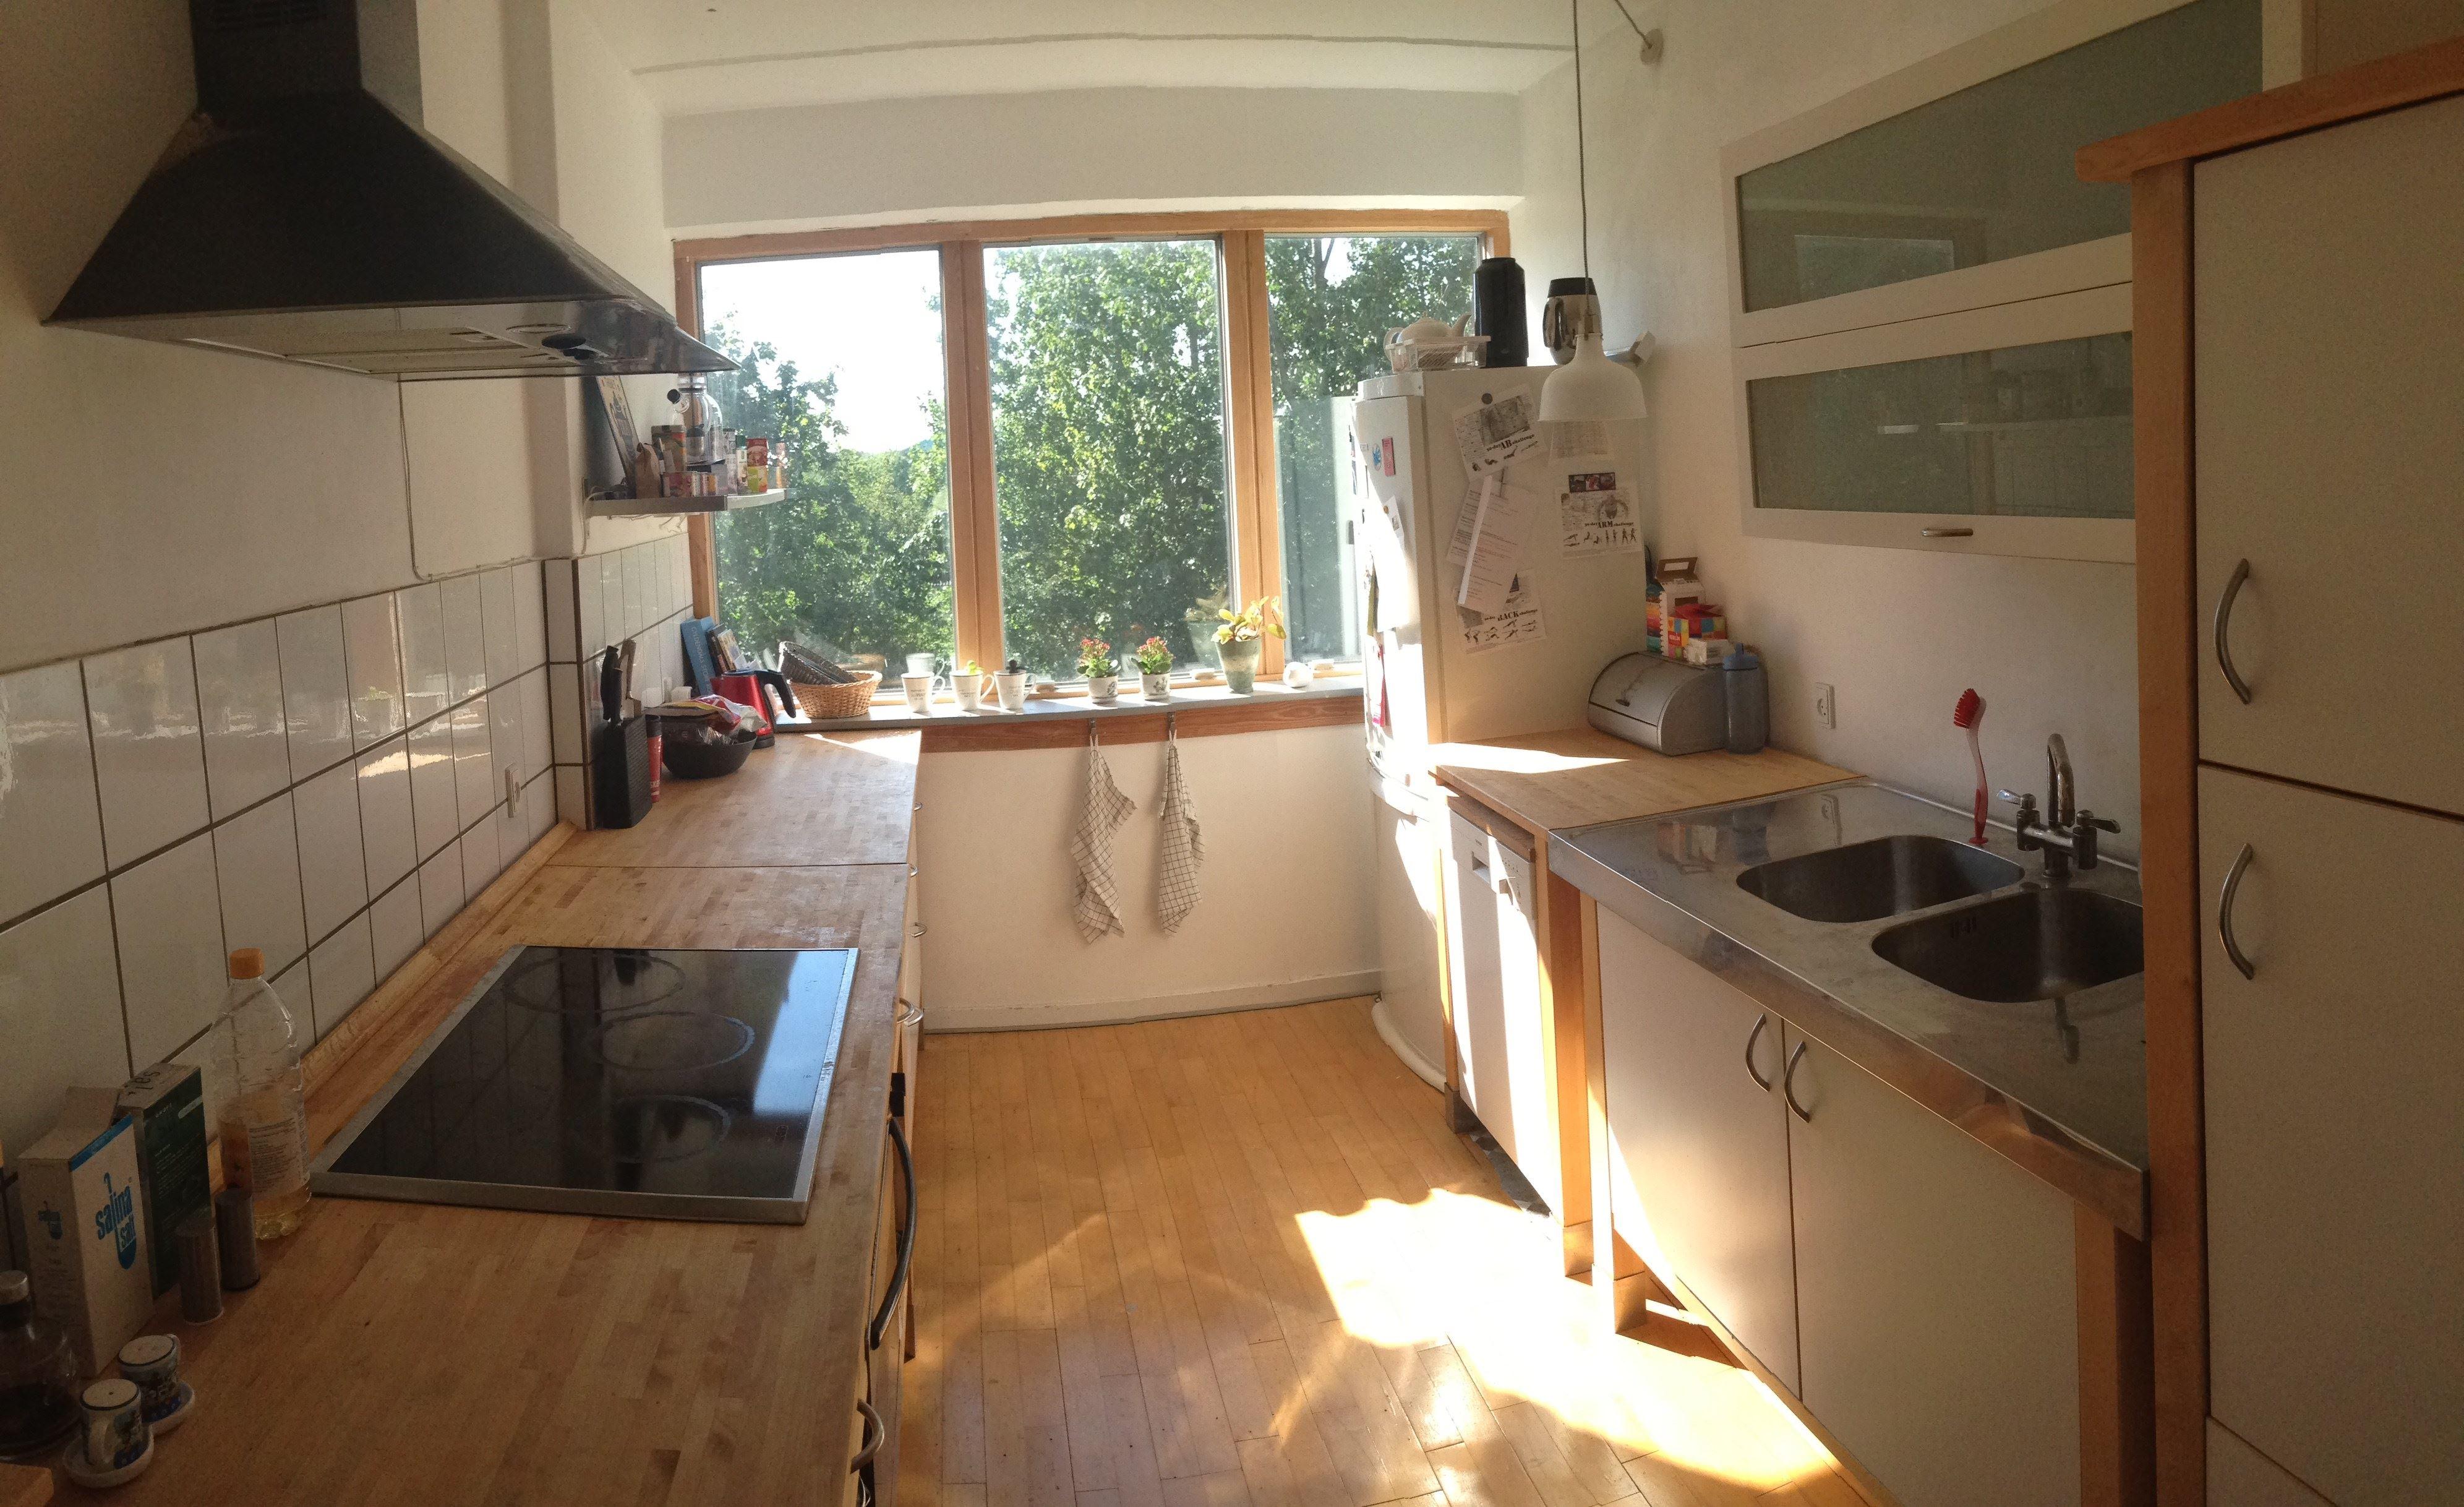 Ejboparken 47, 1. tv., 4000 Roskilde